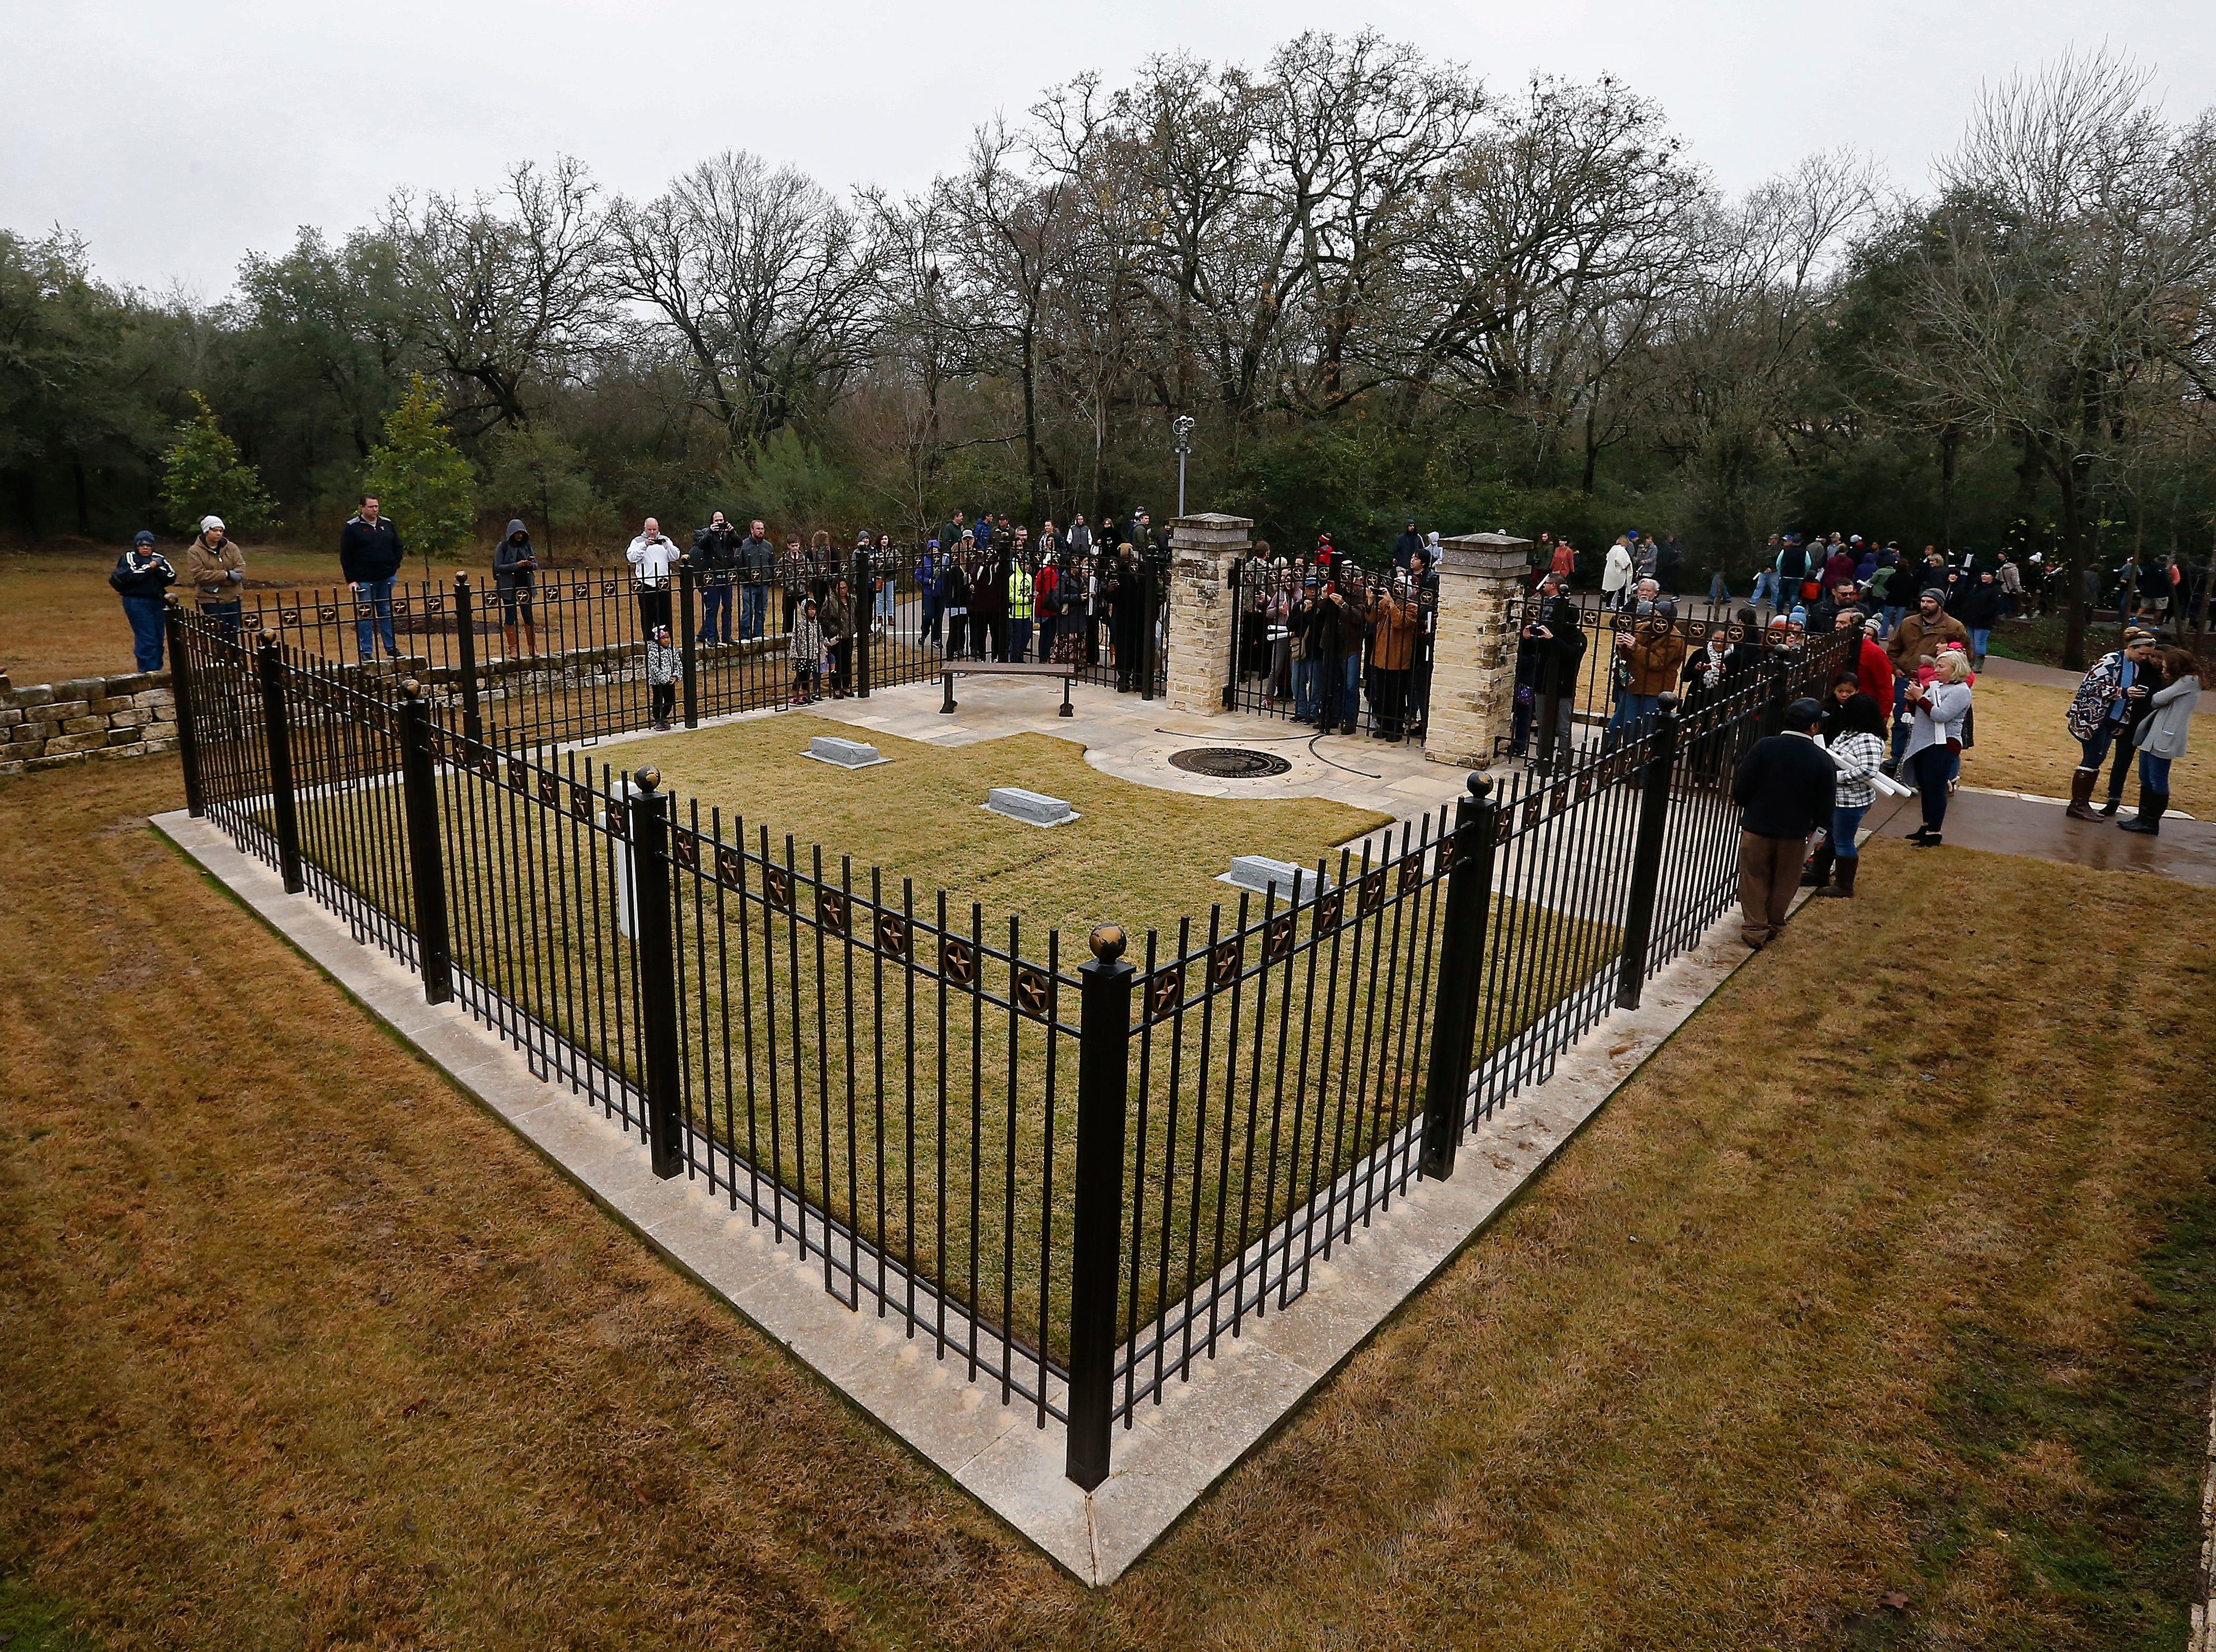 George H W Bush Funeral At St Martin S Church Burial In Texas